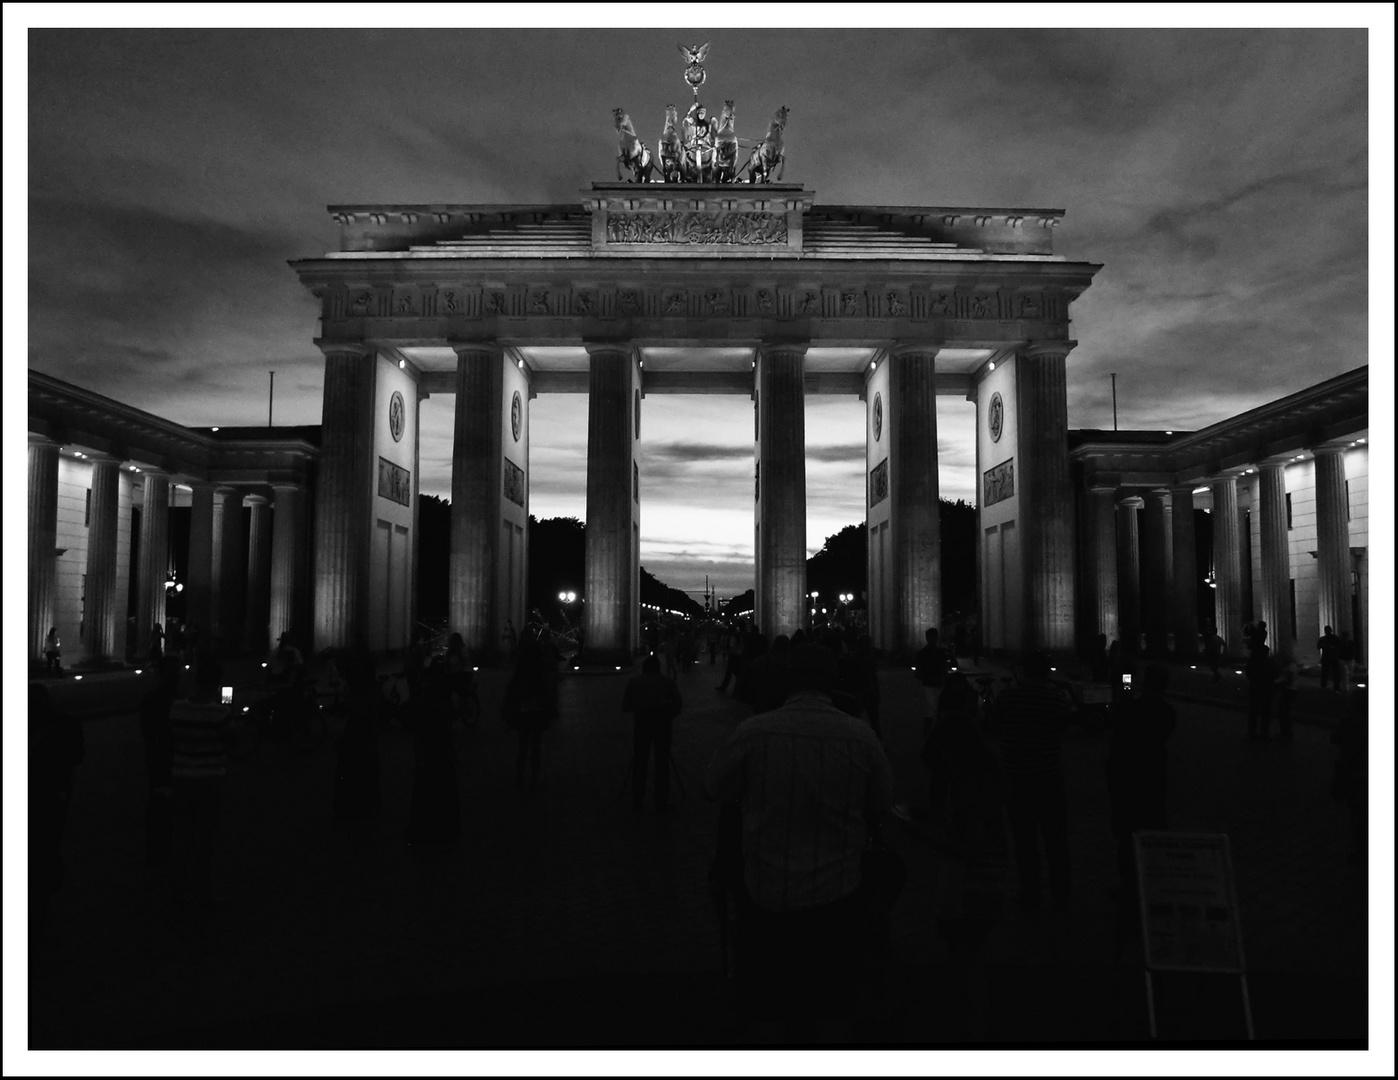 Abend Brandenburger Tor 2013